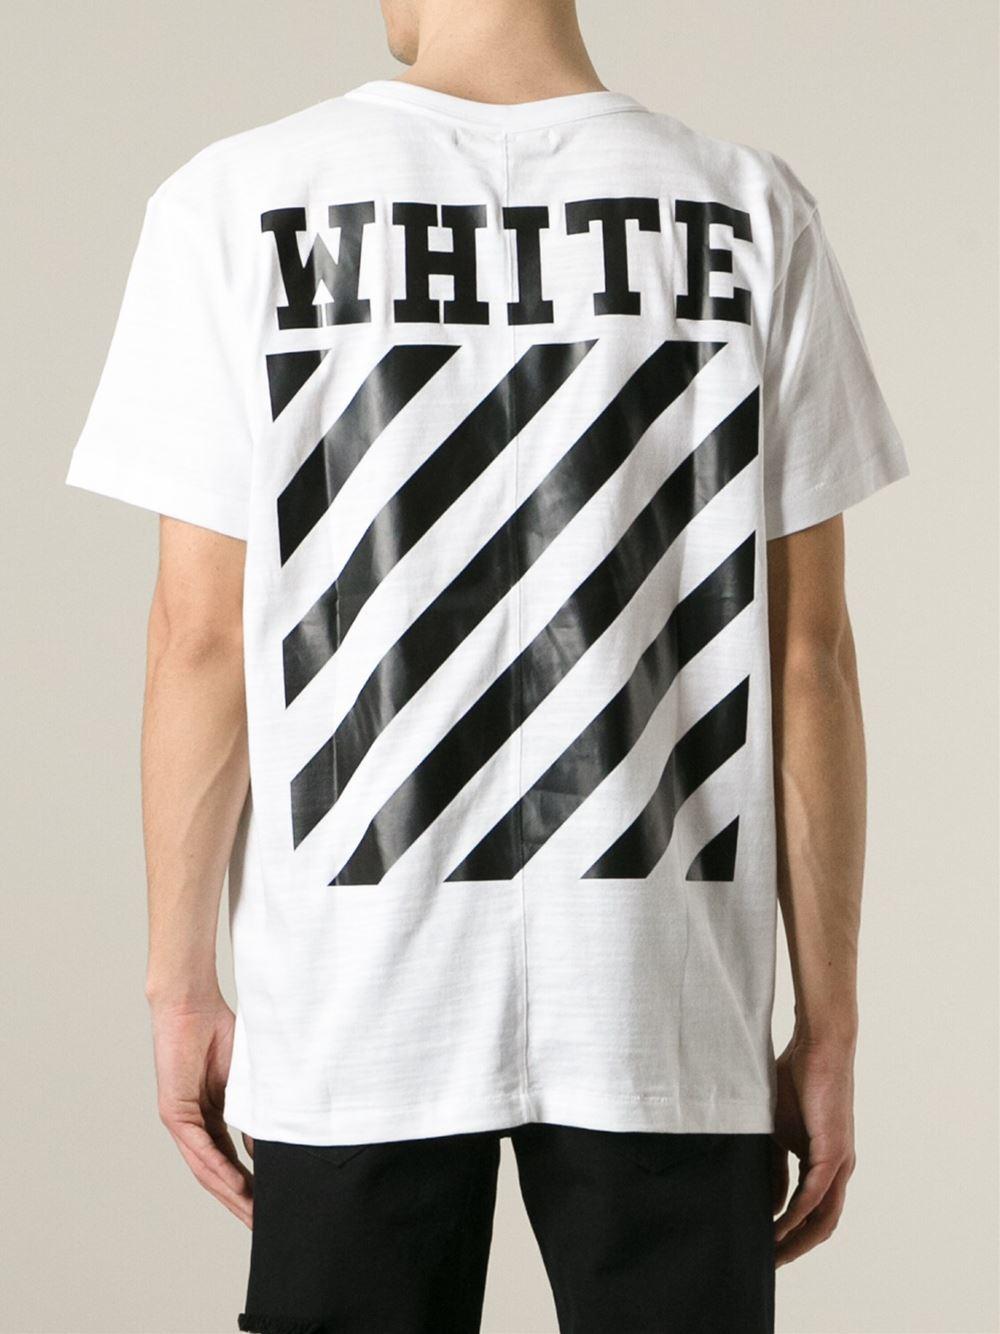 lyst off white c o virgil abloh caravaggio print t shirt in white for men. Black Bedroom Furniture Sets. Home Design Ideas